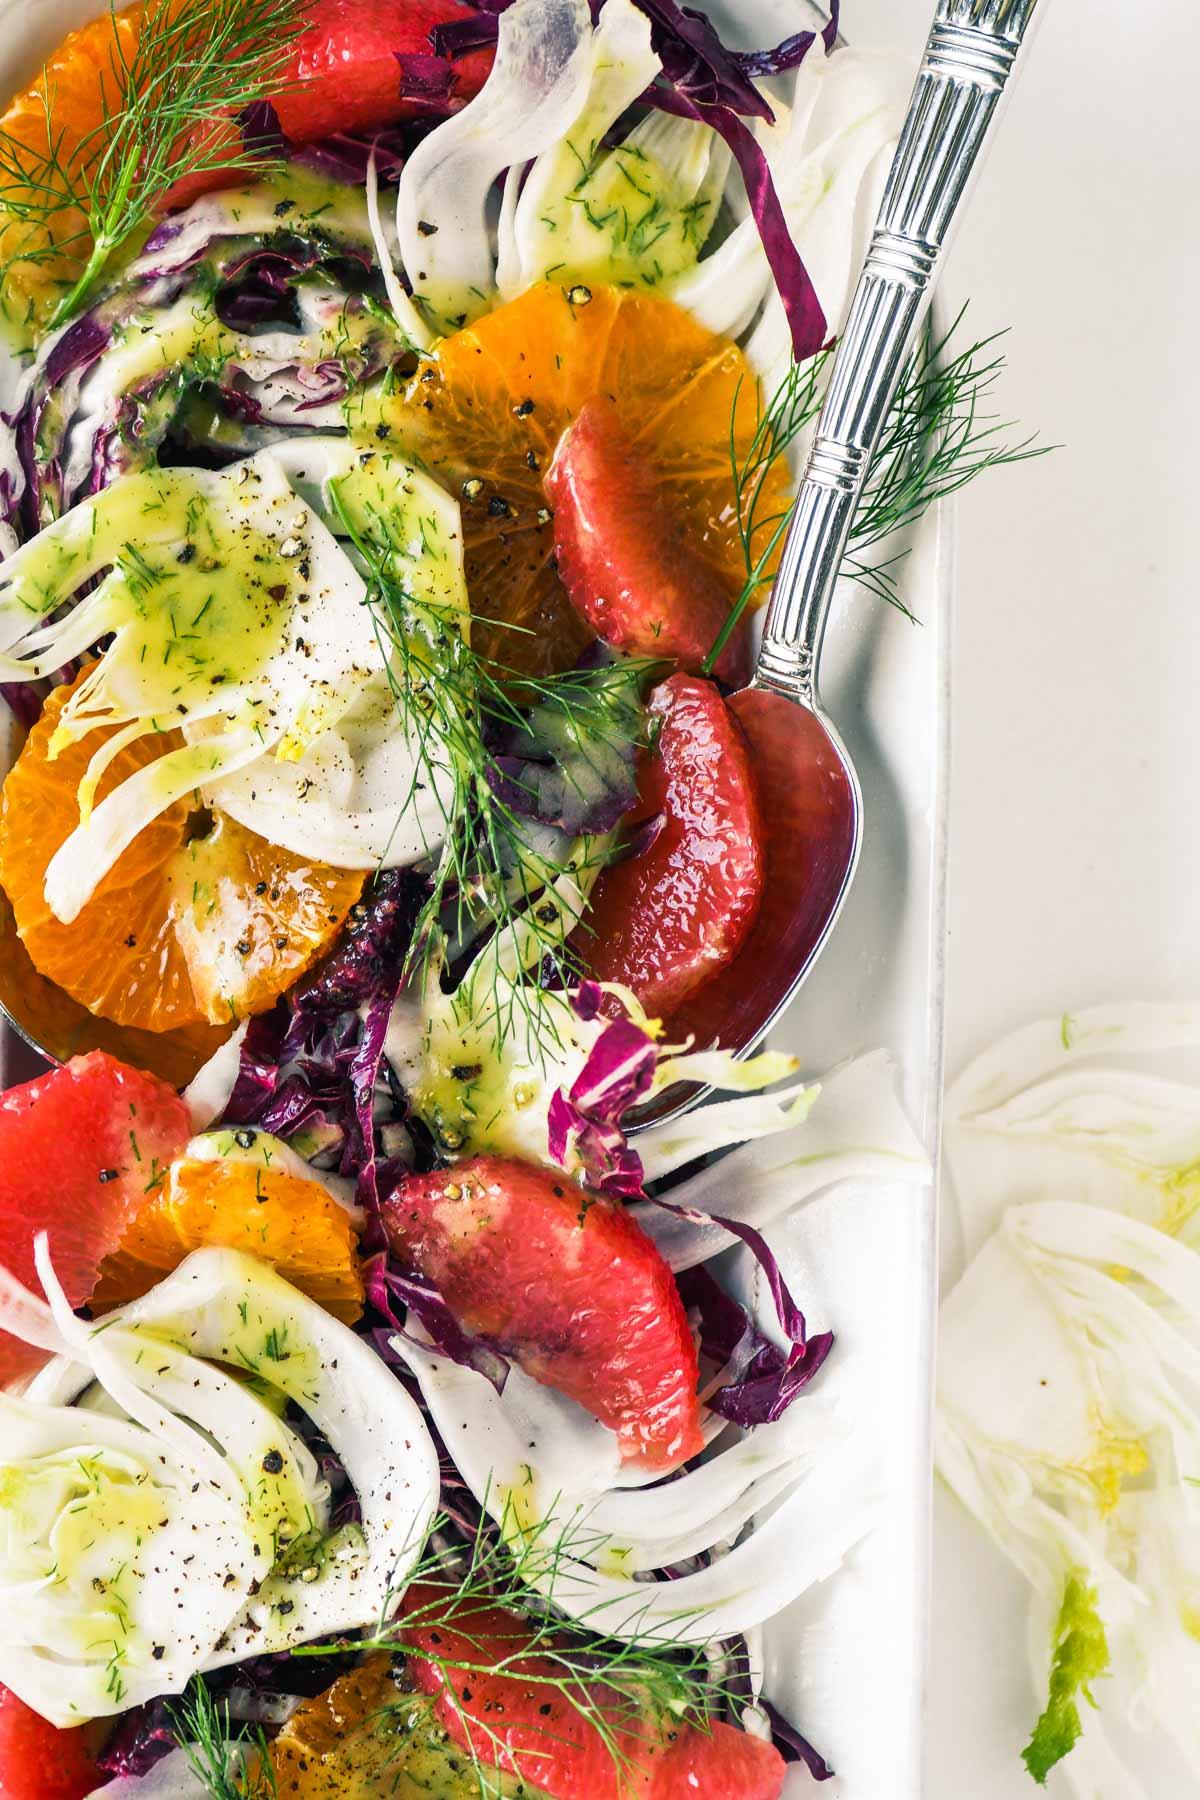 fennel salad with radicchio and citrus fruit